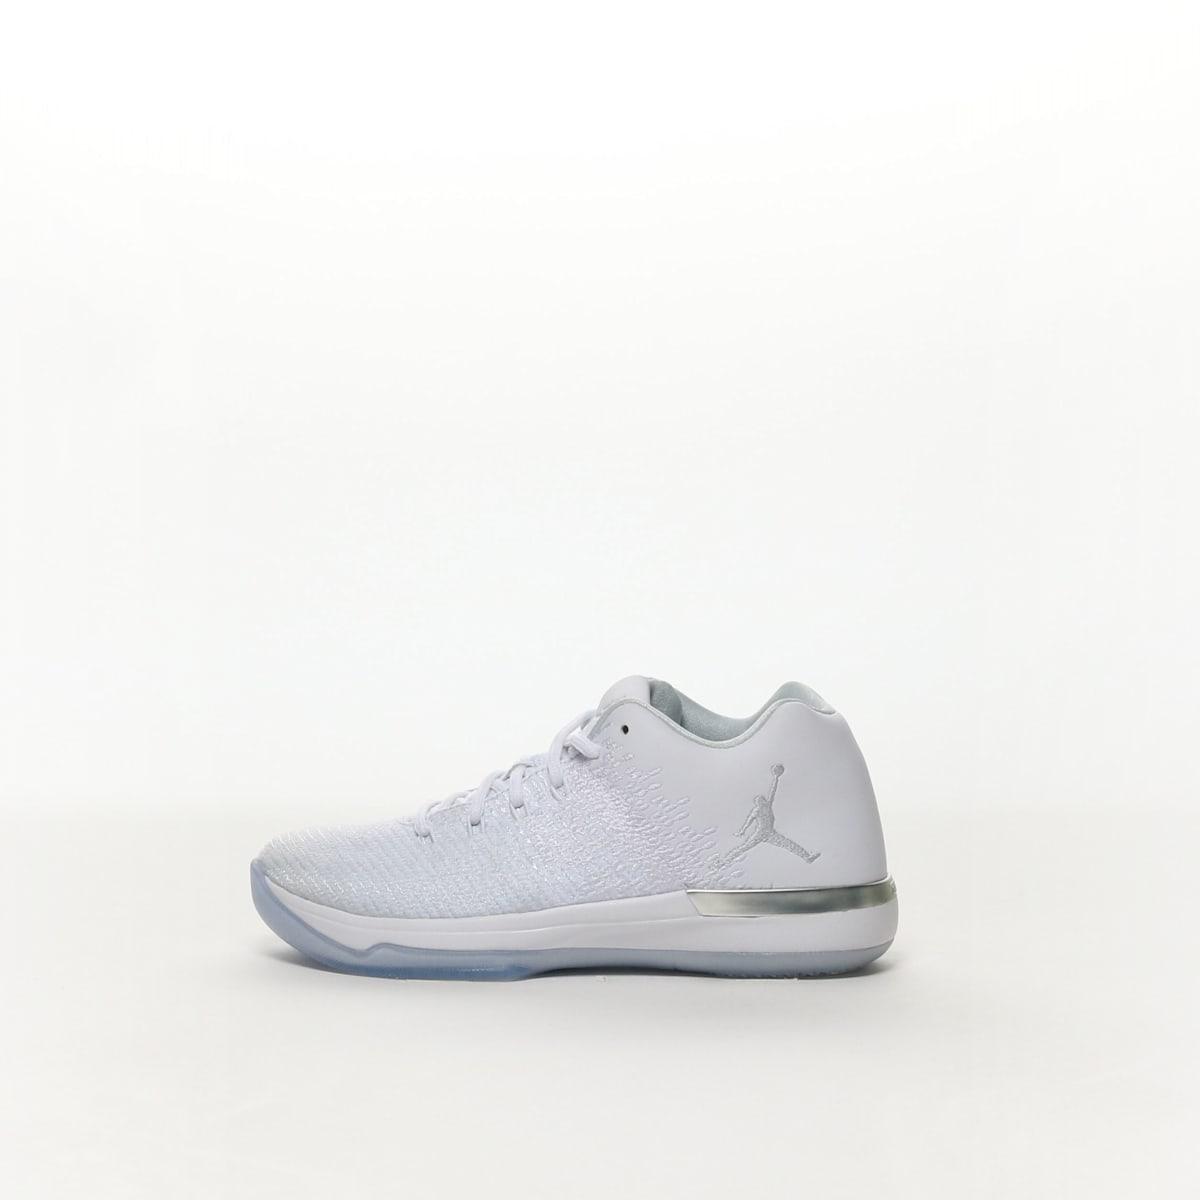 air jordan xxxi low basketball